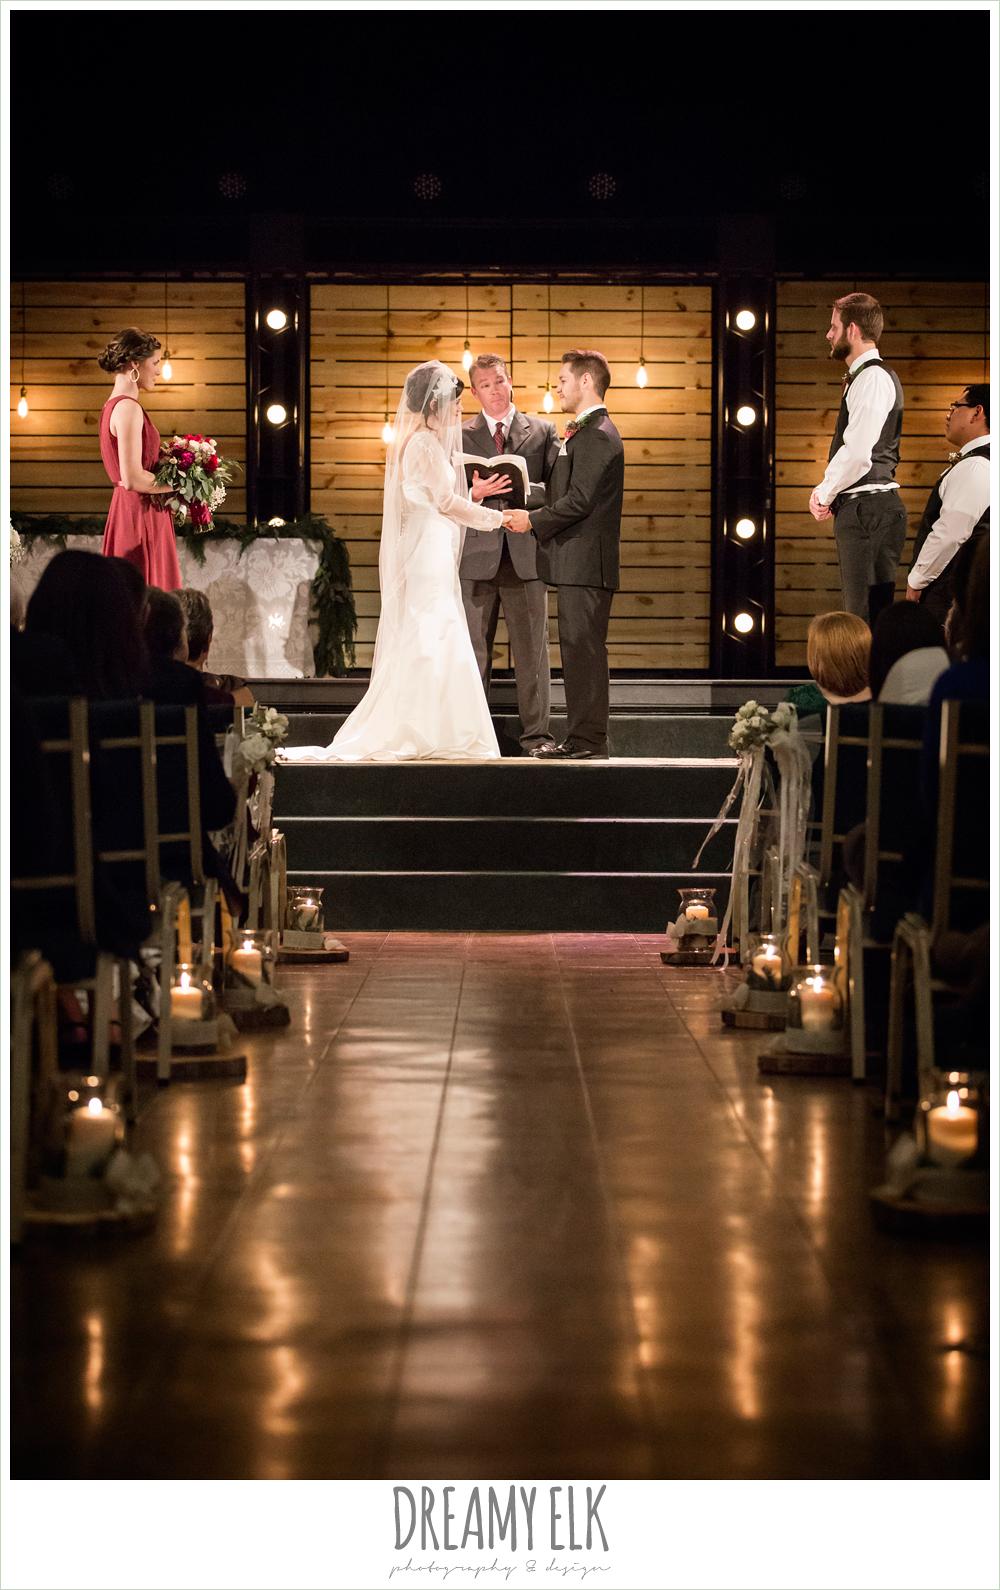 indoor winter december church ceremony wedding photo {dreamy elk photography and design}